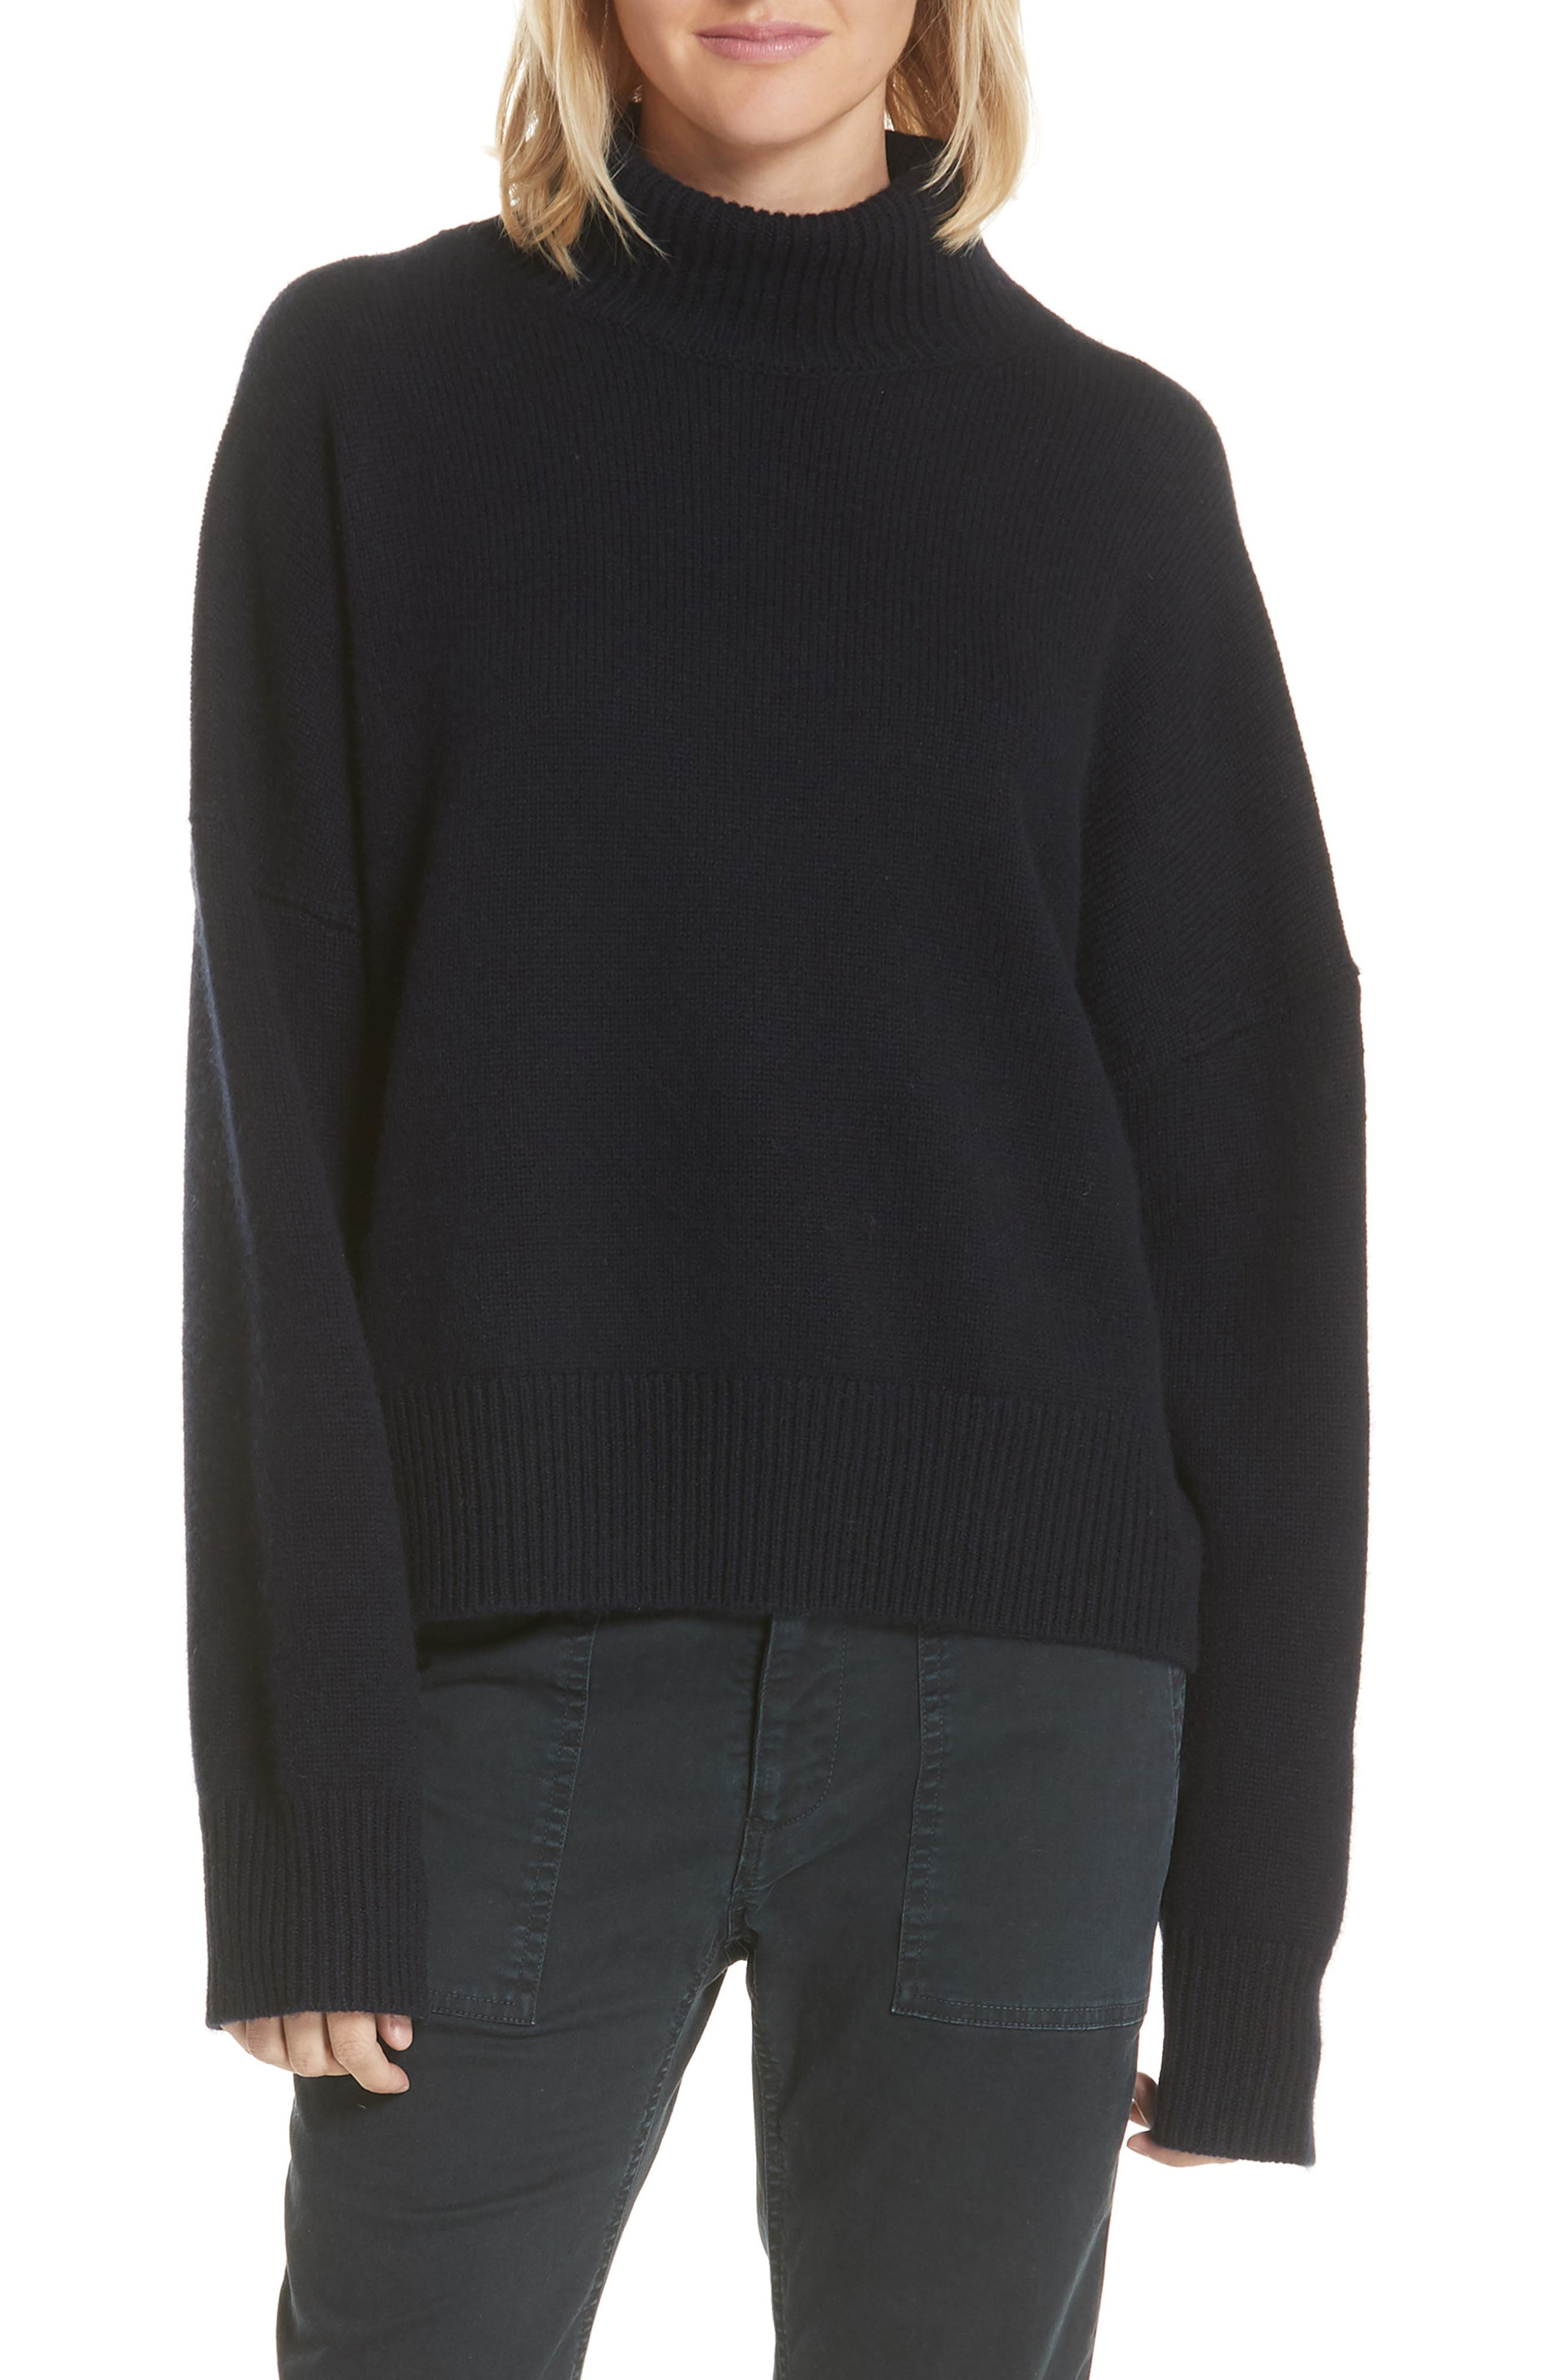 Serinda Wool & Cashmere Turtleneck Sweater,                         Main,                         color, Dark Navy